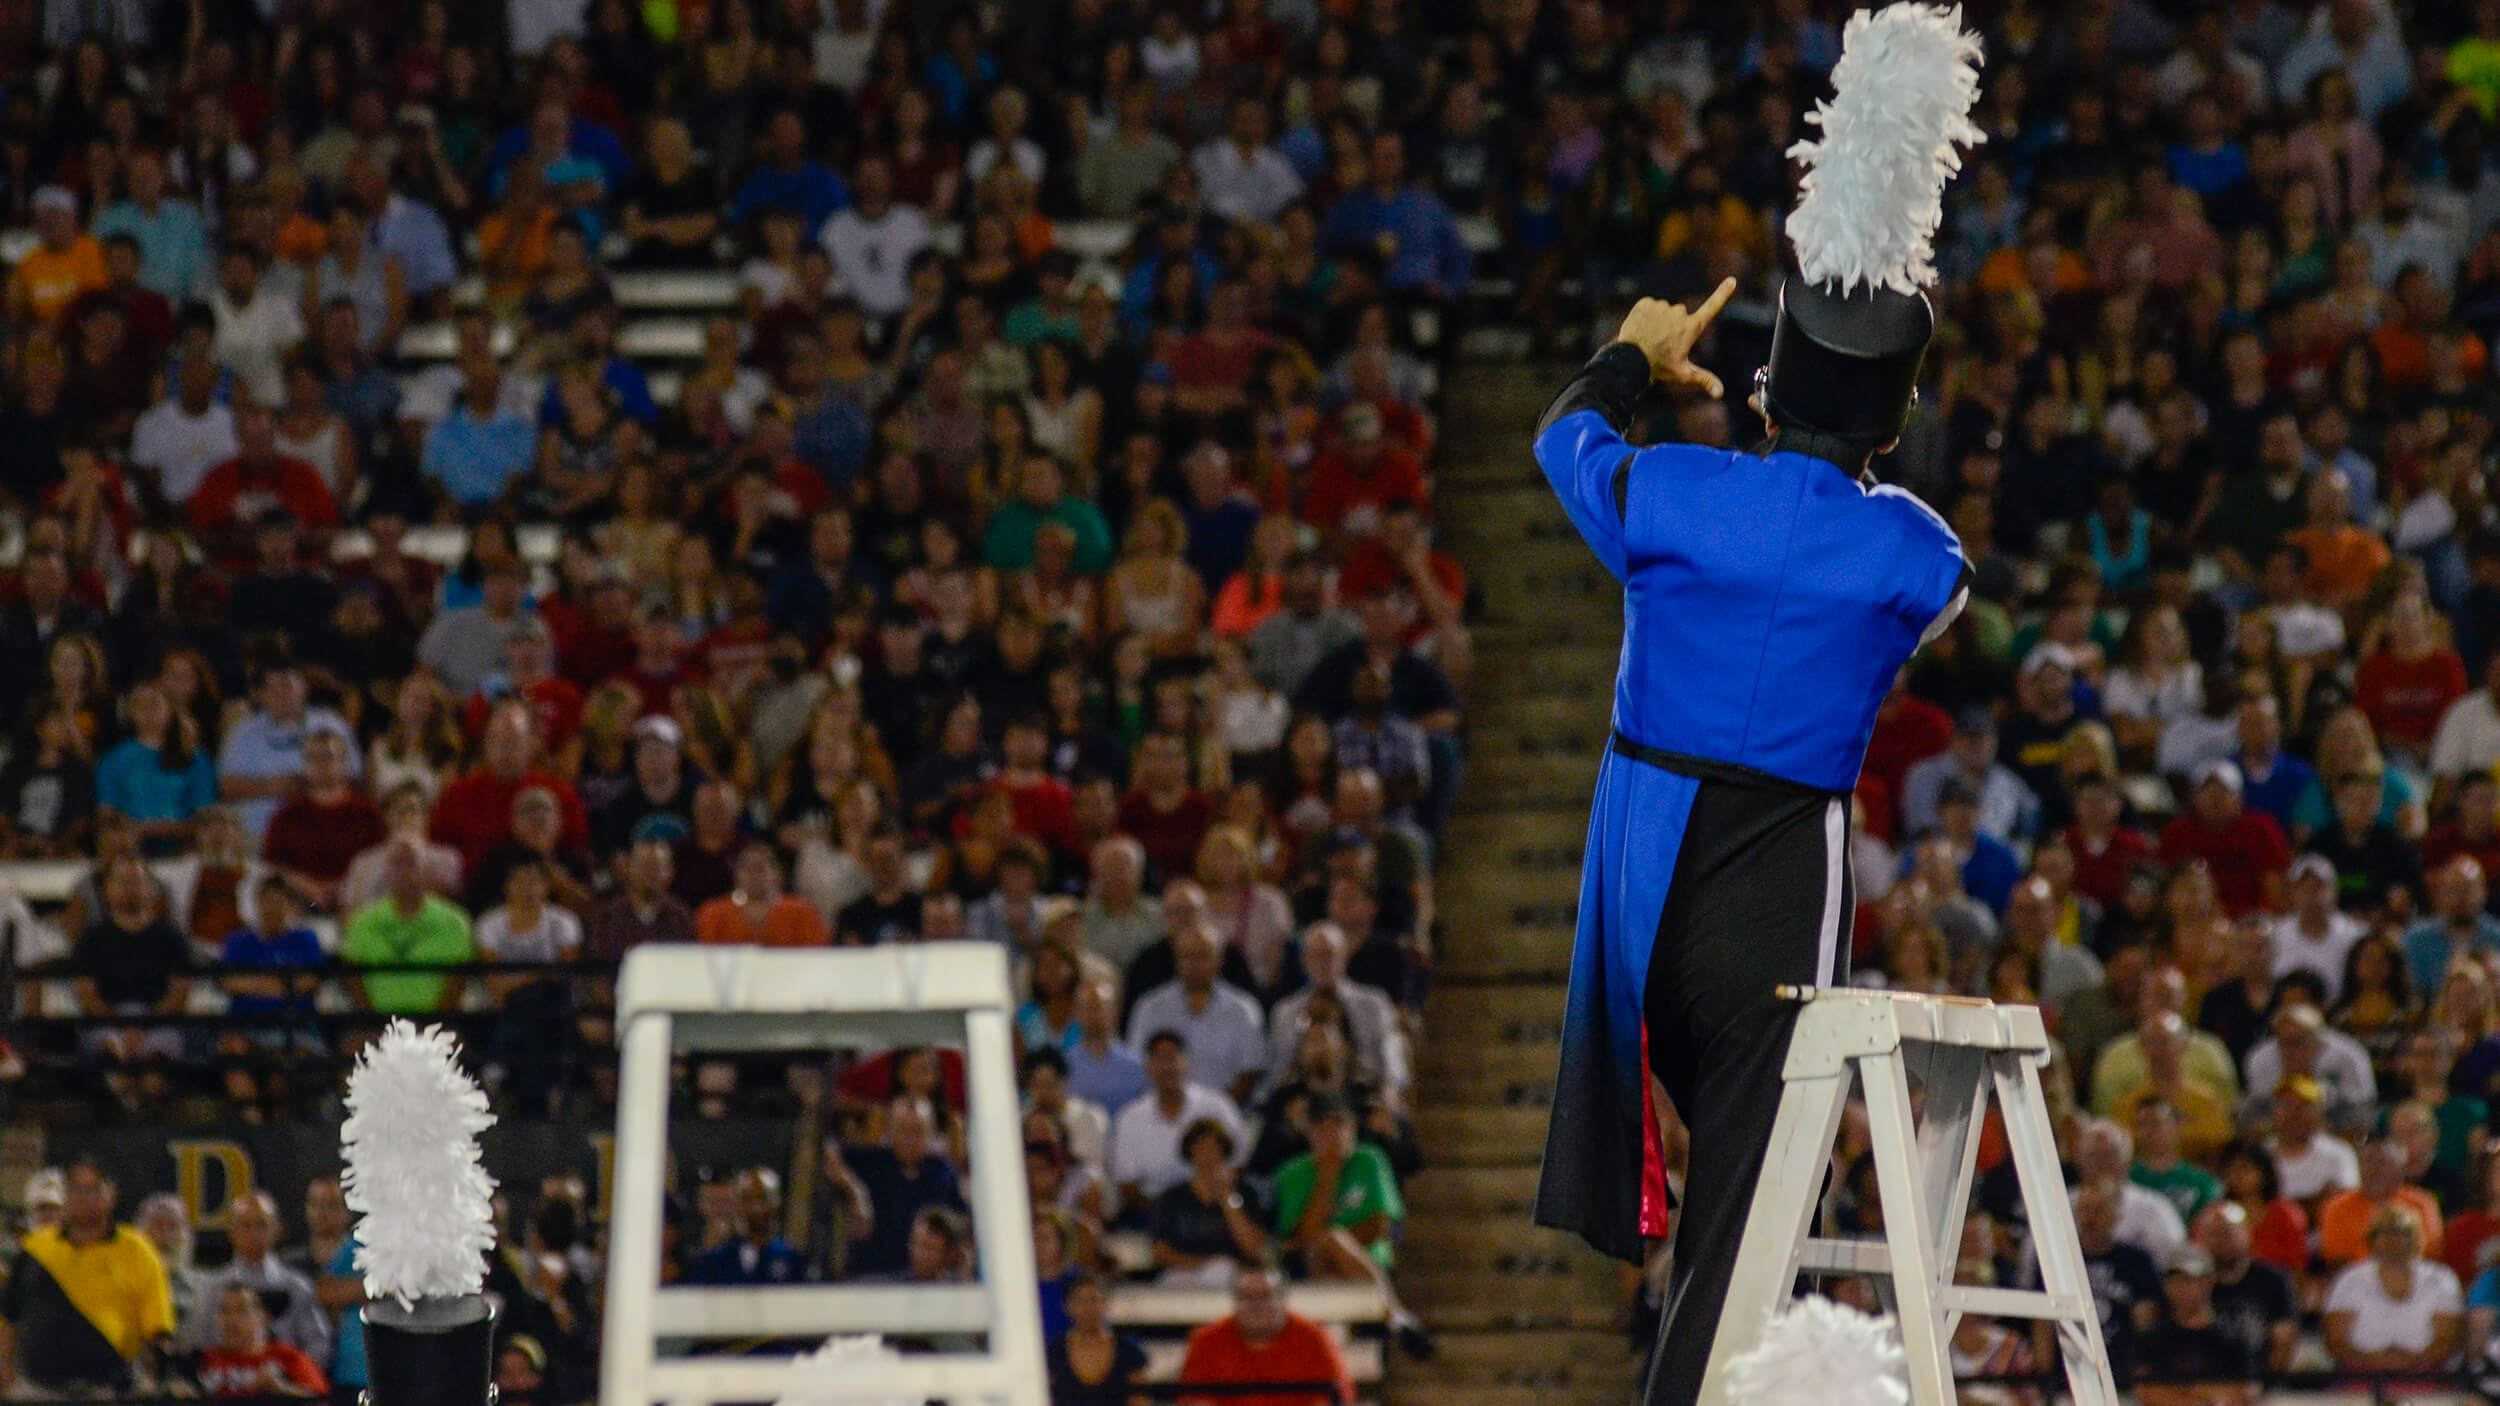 Nashville event offers glimpse of competition to come Saturday in Atlanta